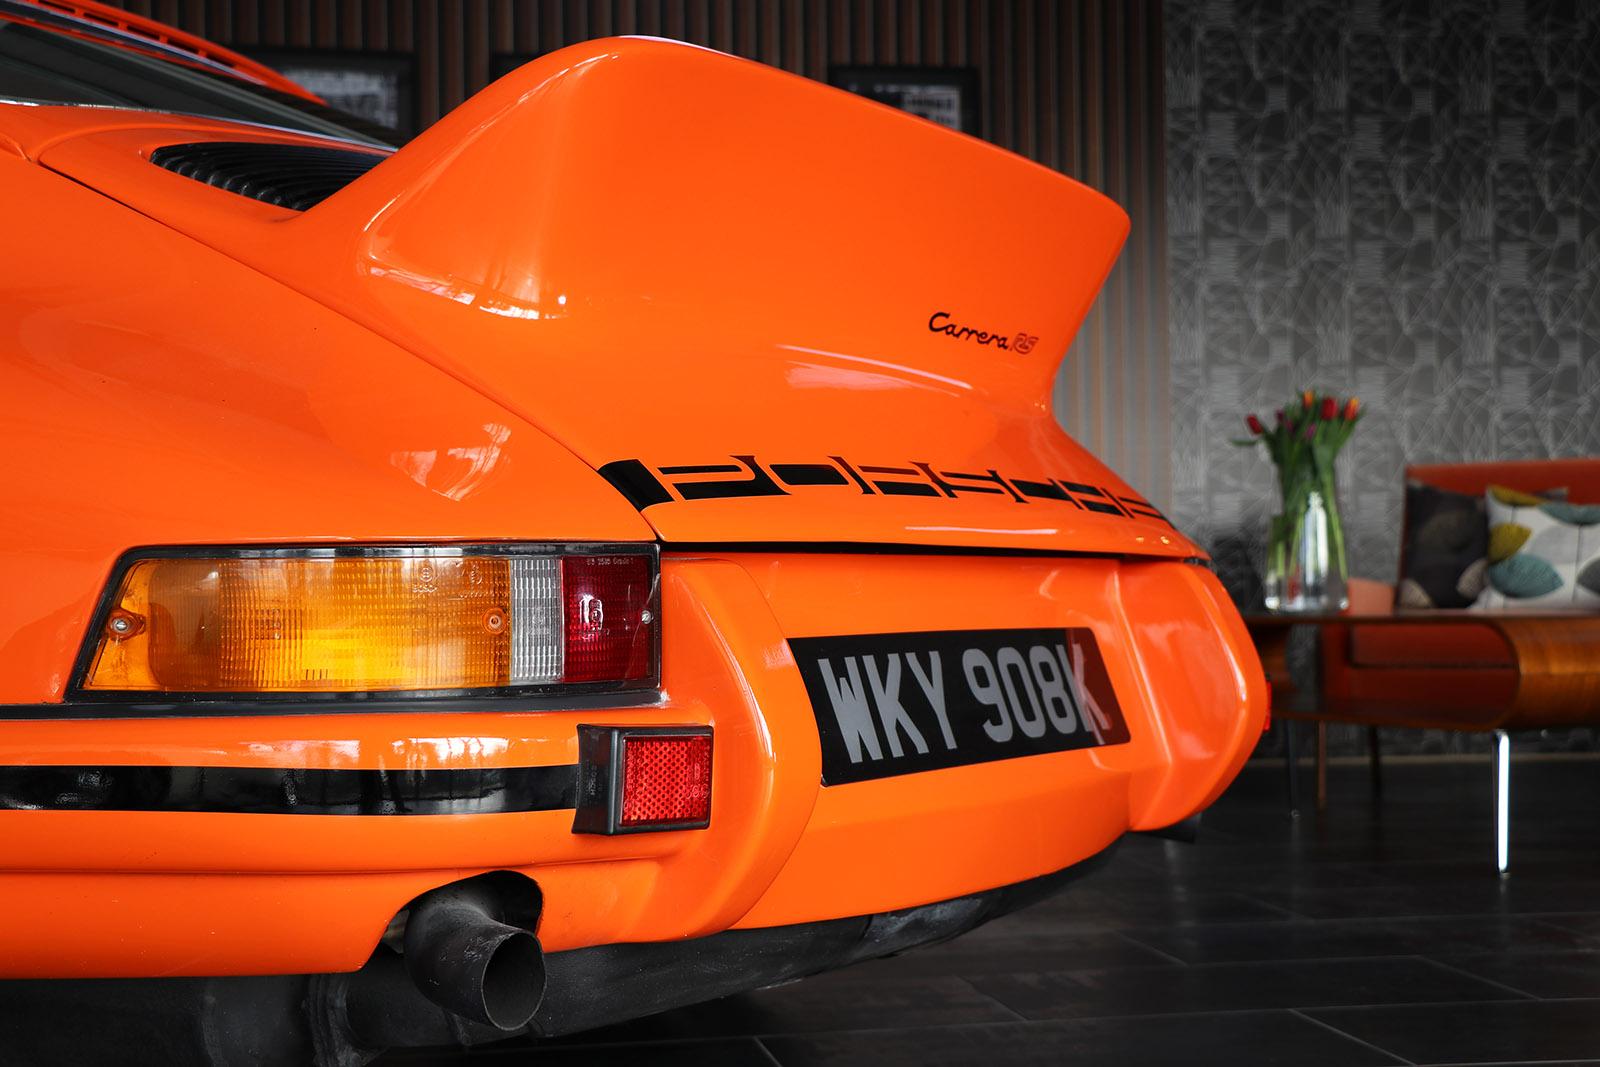 1972-Porsche 911 S-orange-evocation-sayer selection-6-web.jpg